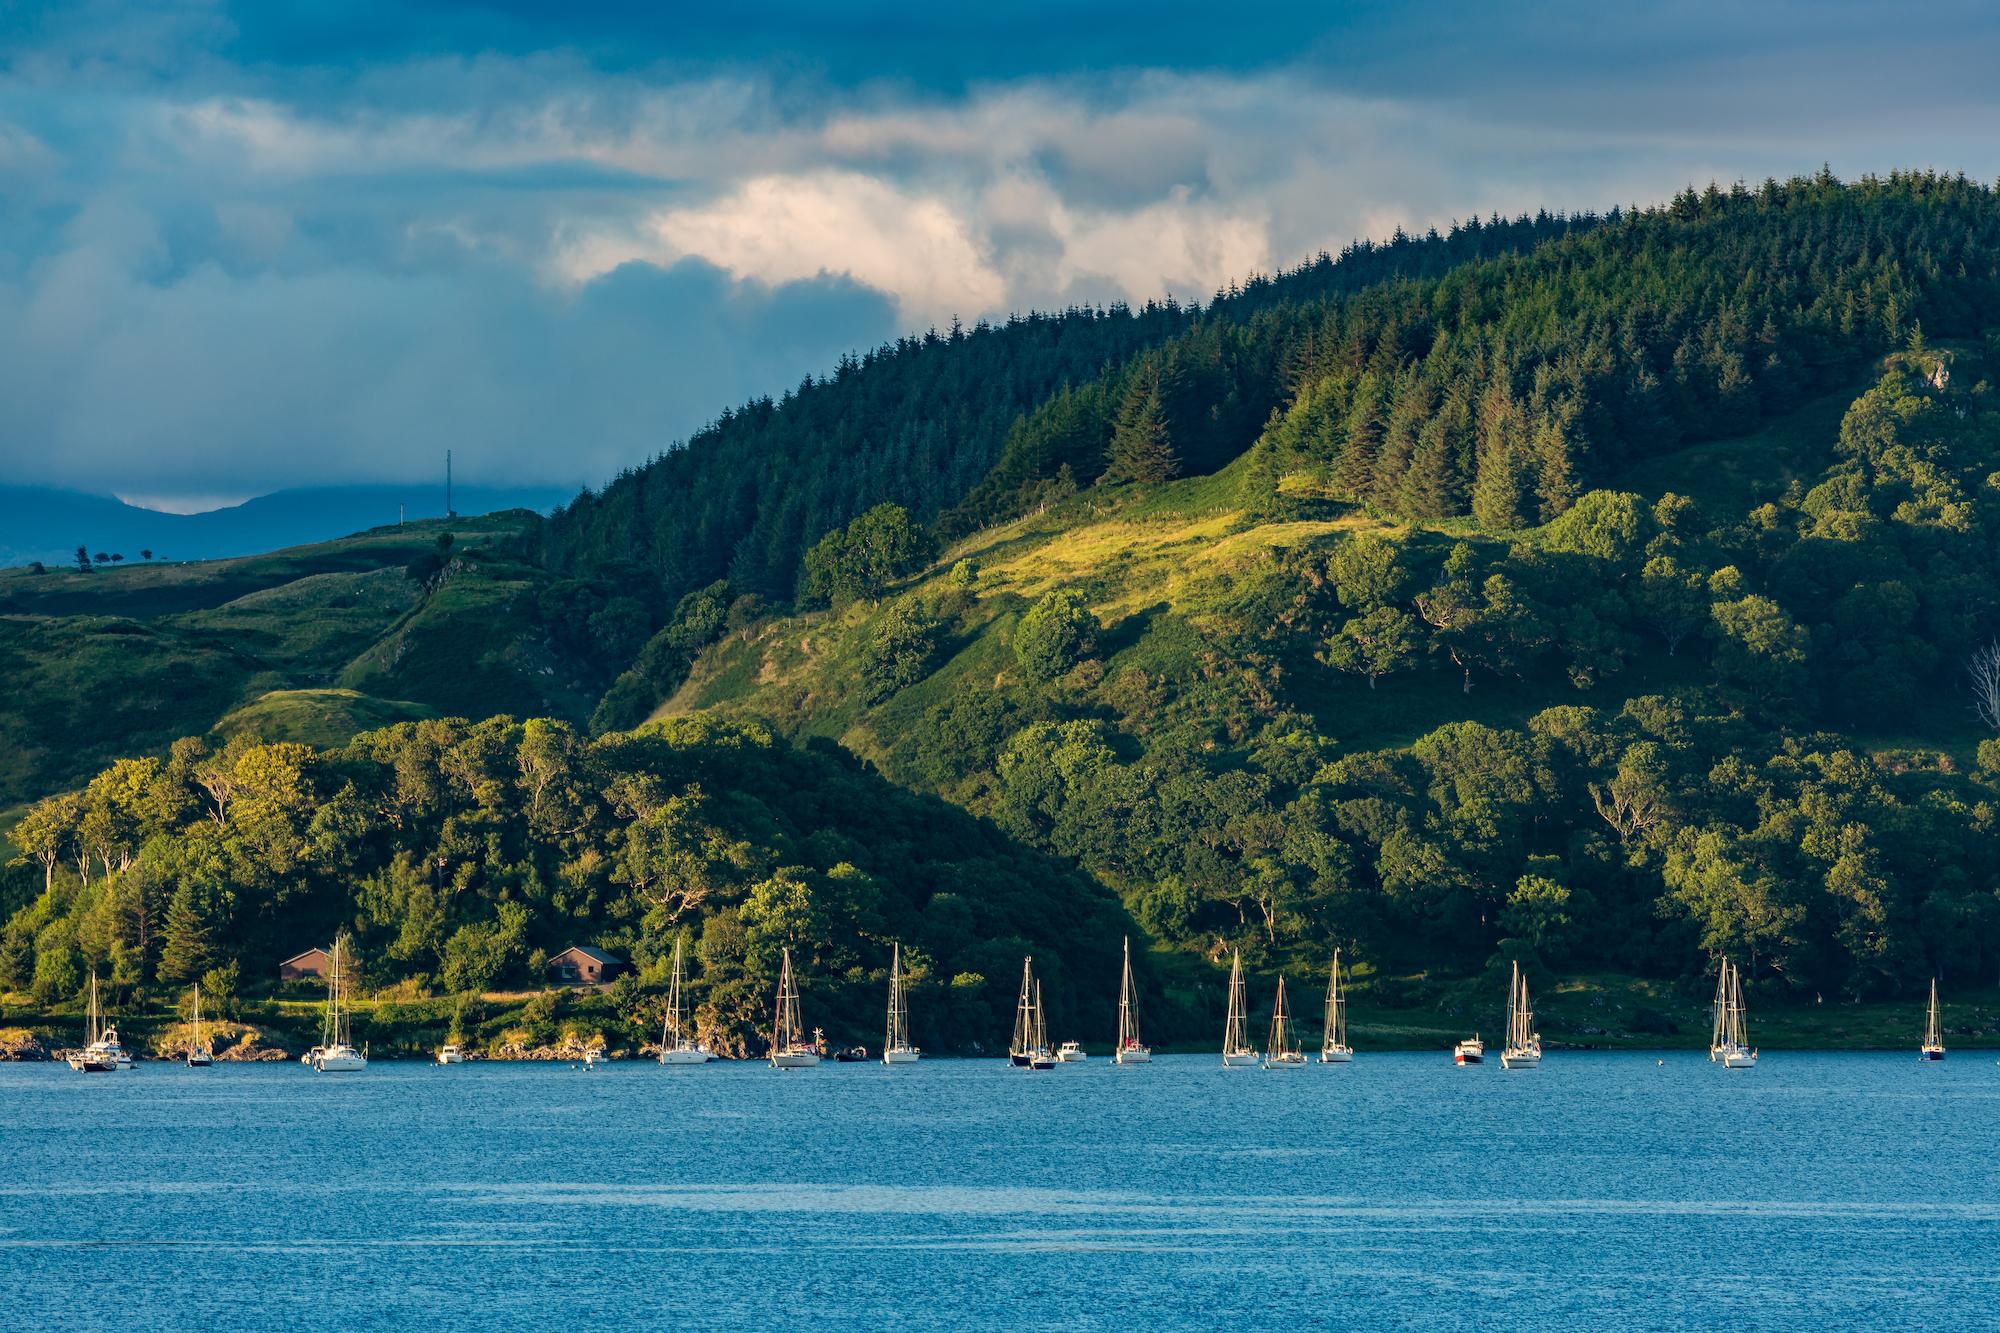 (559) Yachts on Loch Feochan, Ardentallen, Oban, Argyll and Bute, Scotland. Copyright David Wheater.jpg